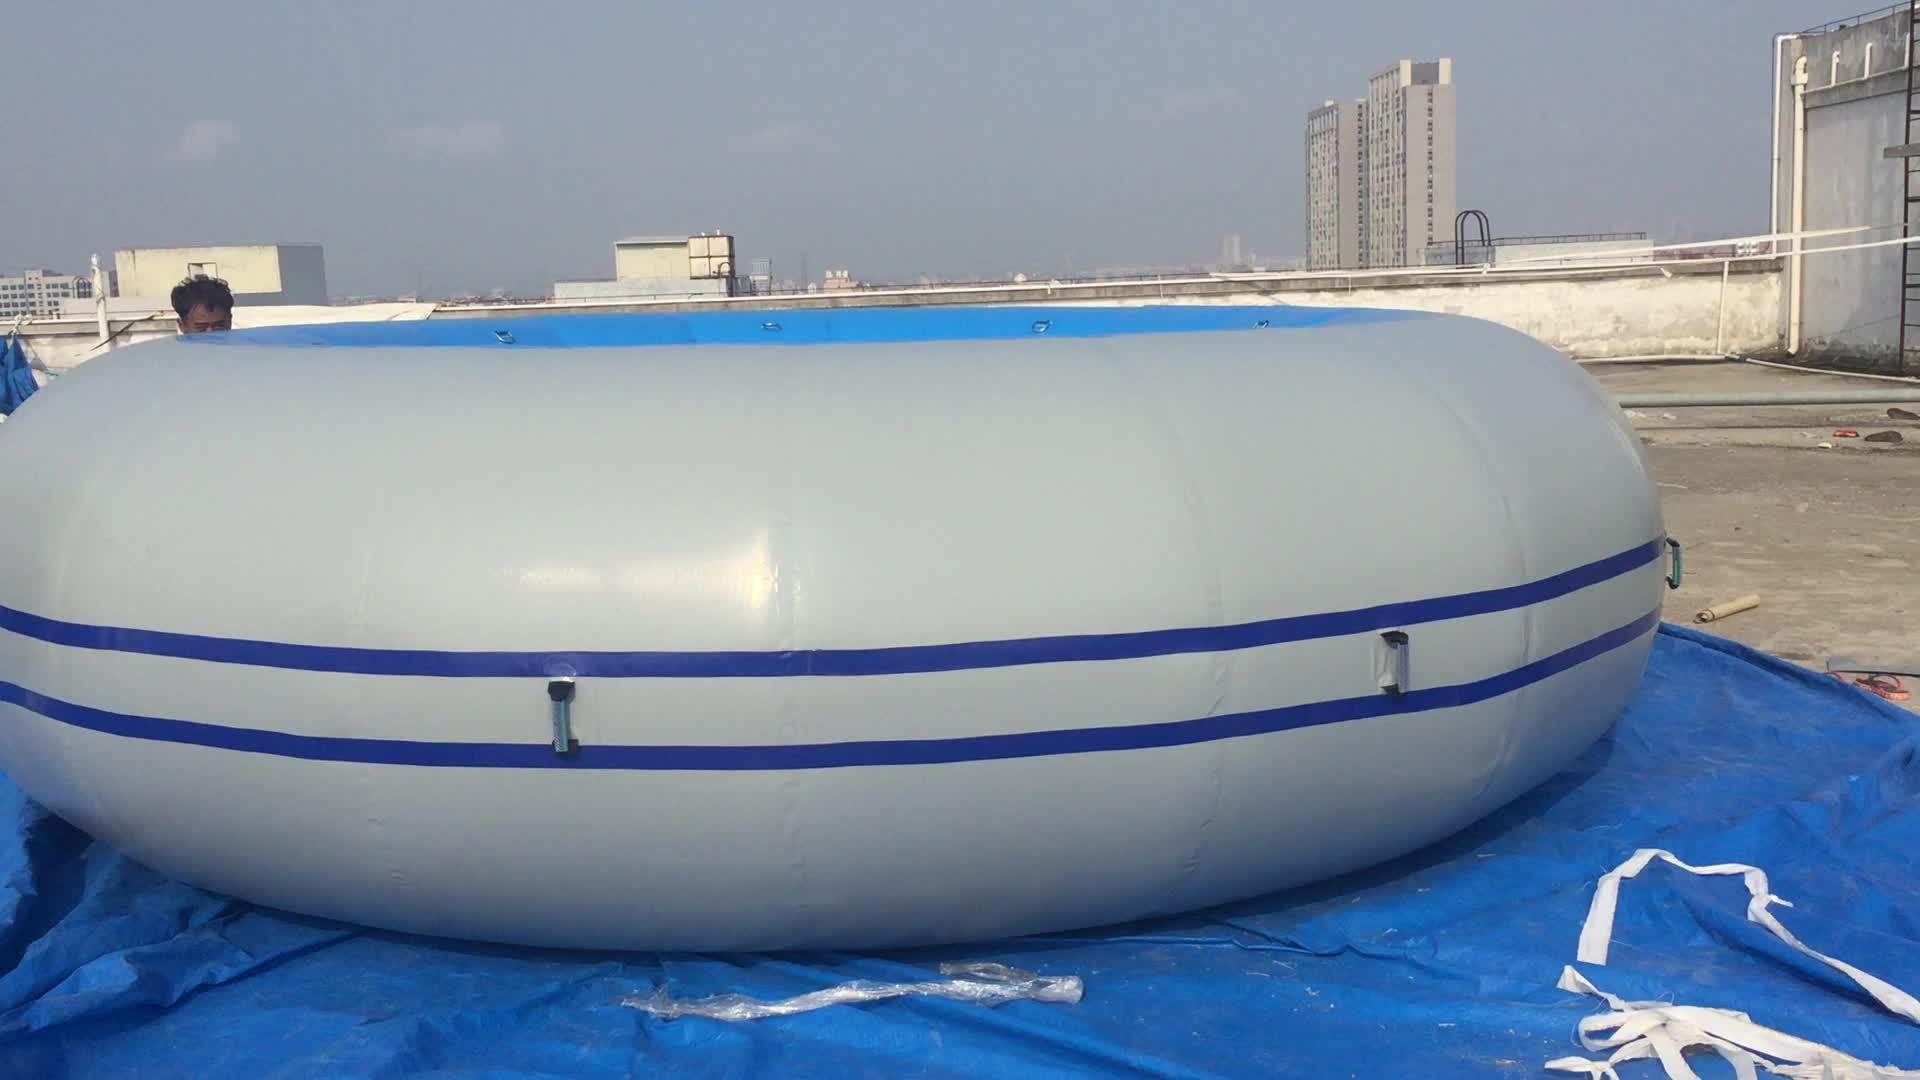 7ml X 7mw Inflatable Pool Swimming Pool Cover W8010 Buy Swimming Pool Cover Inflatable Pool